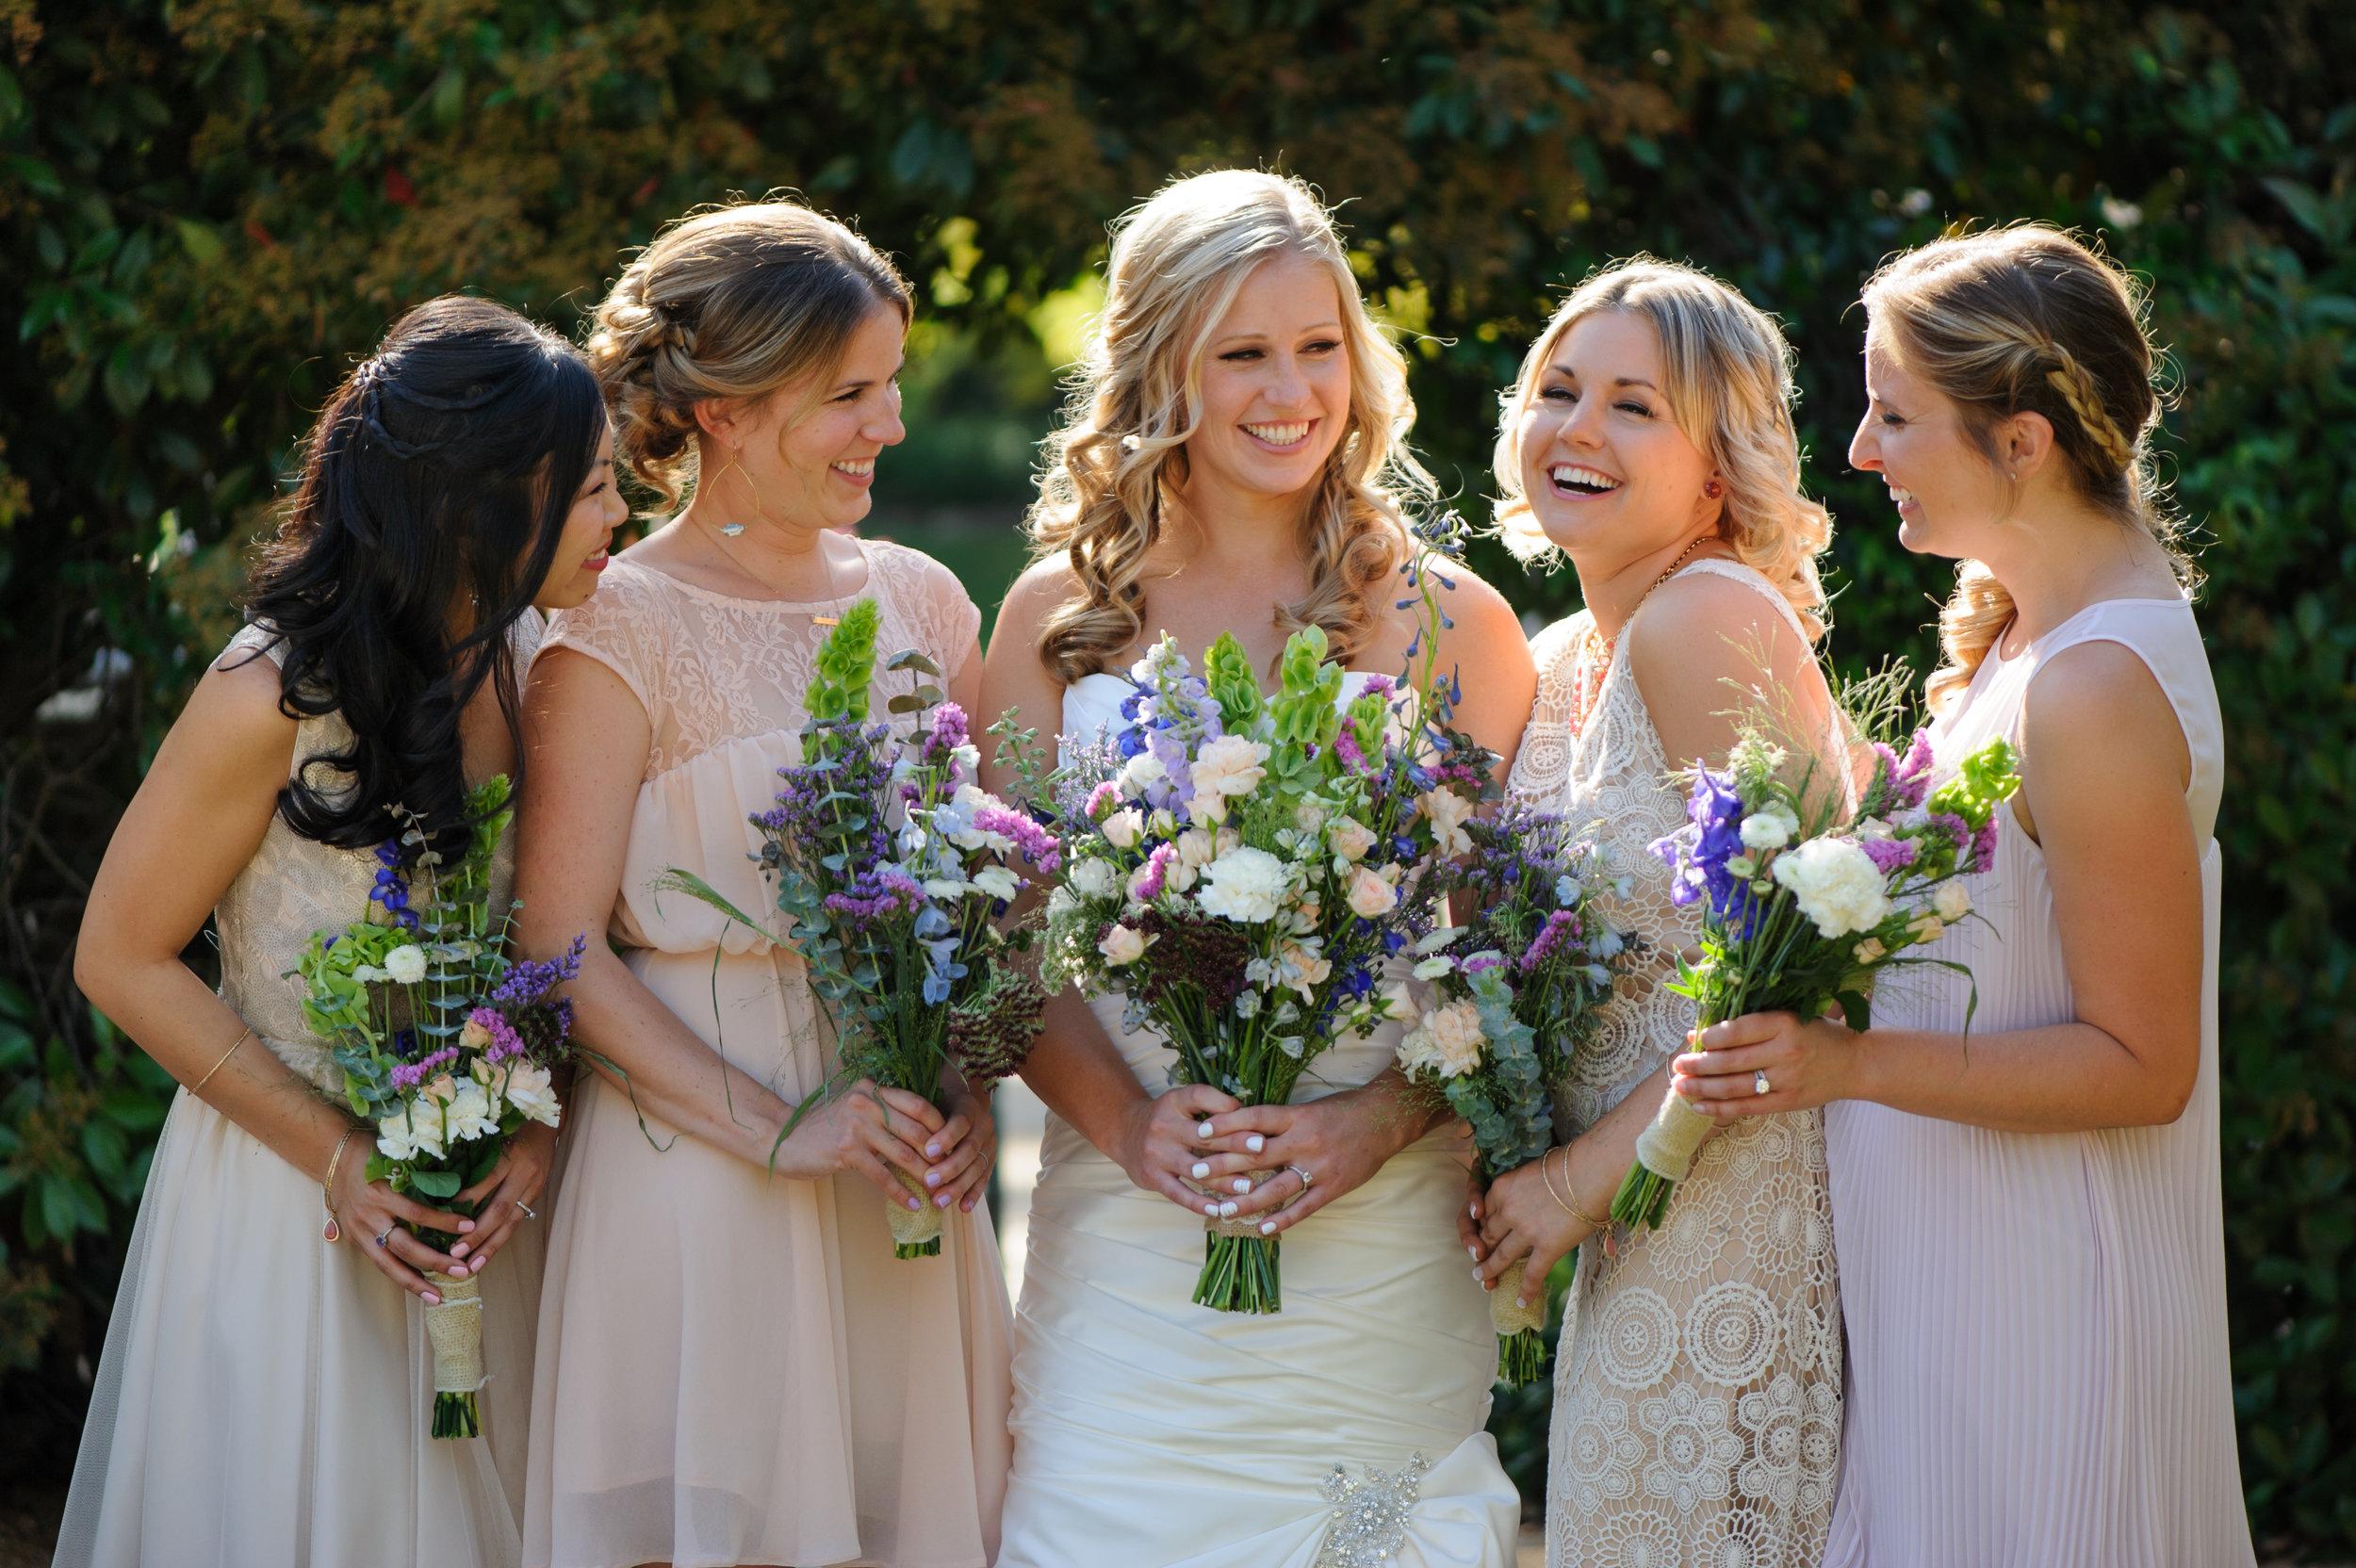 lindsey-alex-012-backyard-sacramento-wedding-photographer-katherine-nicole-photography.JPG